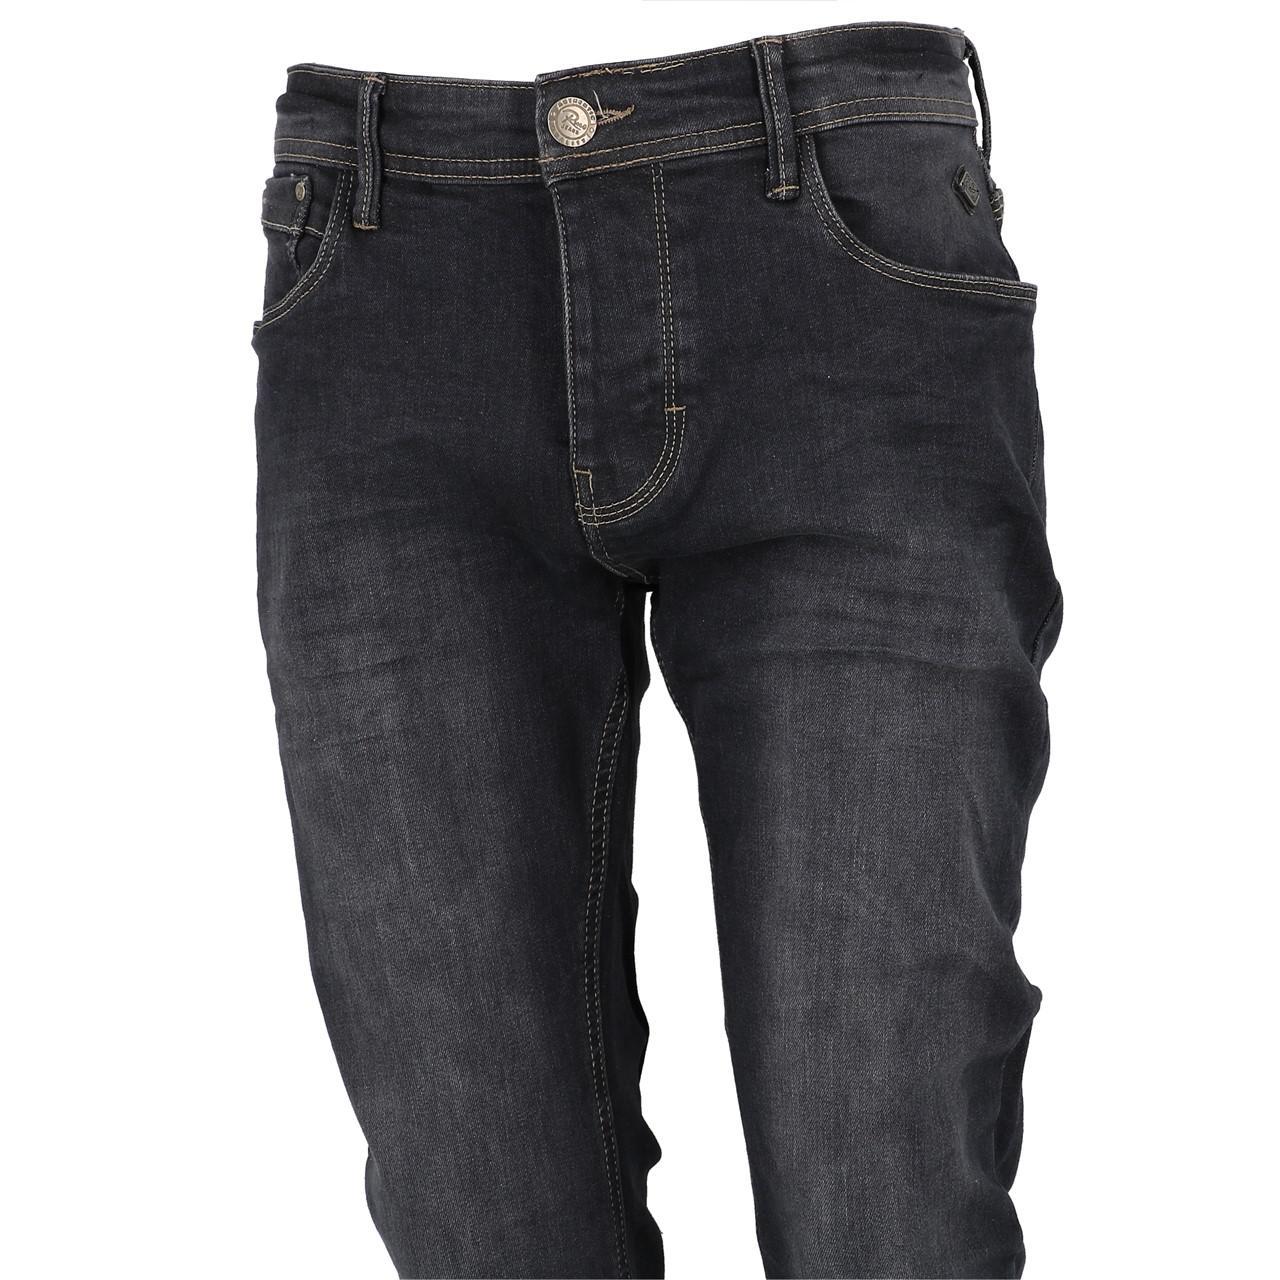 Jeans-Pants-RMS-26-Jeans-Grey-Blue-Regular-Blue-27122-New thumbnail 3